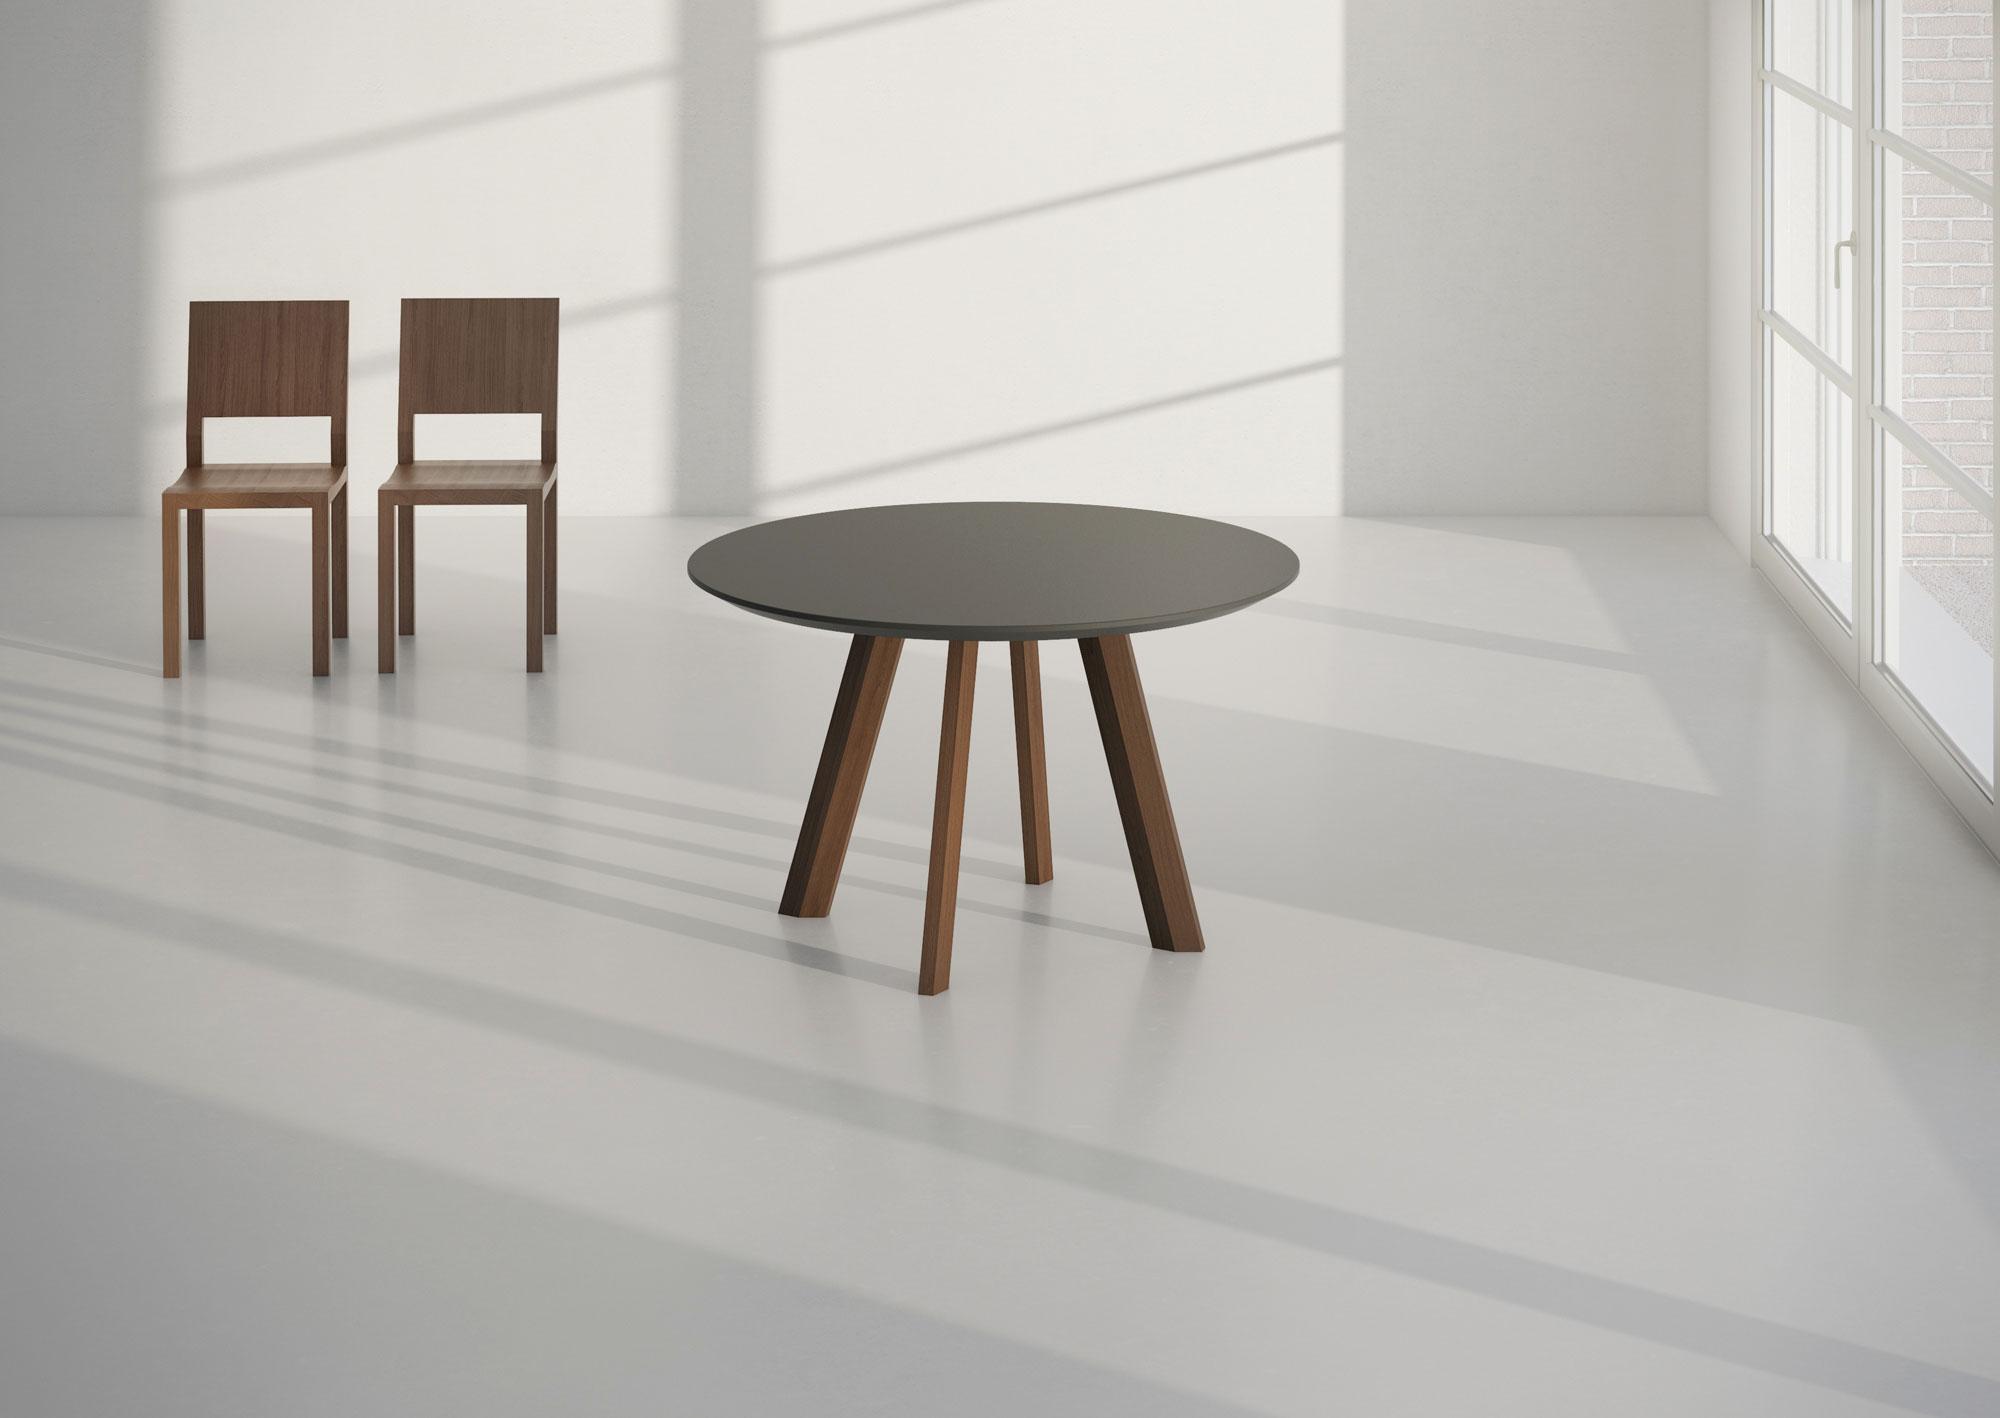 HR_D_T_RHOMBI-R-LINO_4_B10x6_vitamin-design_rhombi_round-table_tisch_linoleum_studio Impressionnant De Table Ronde Ikea Conception